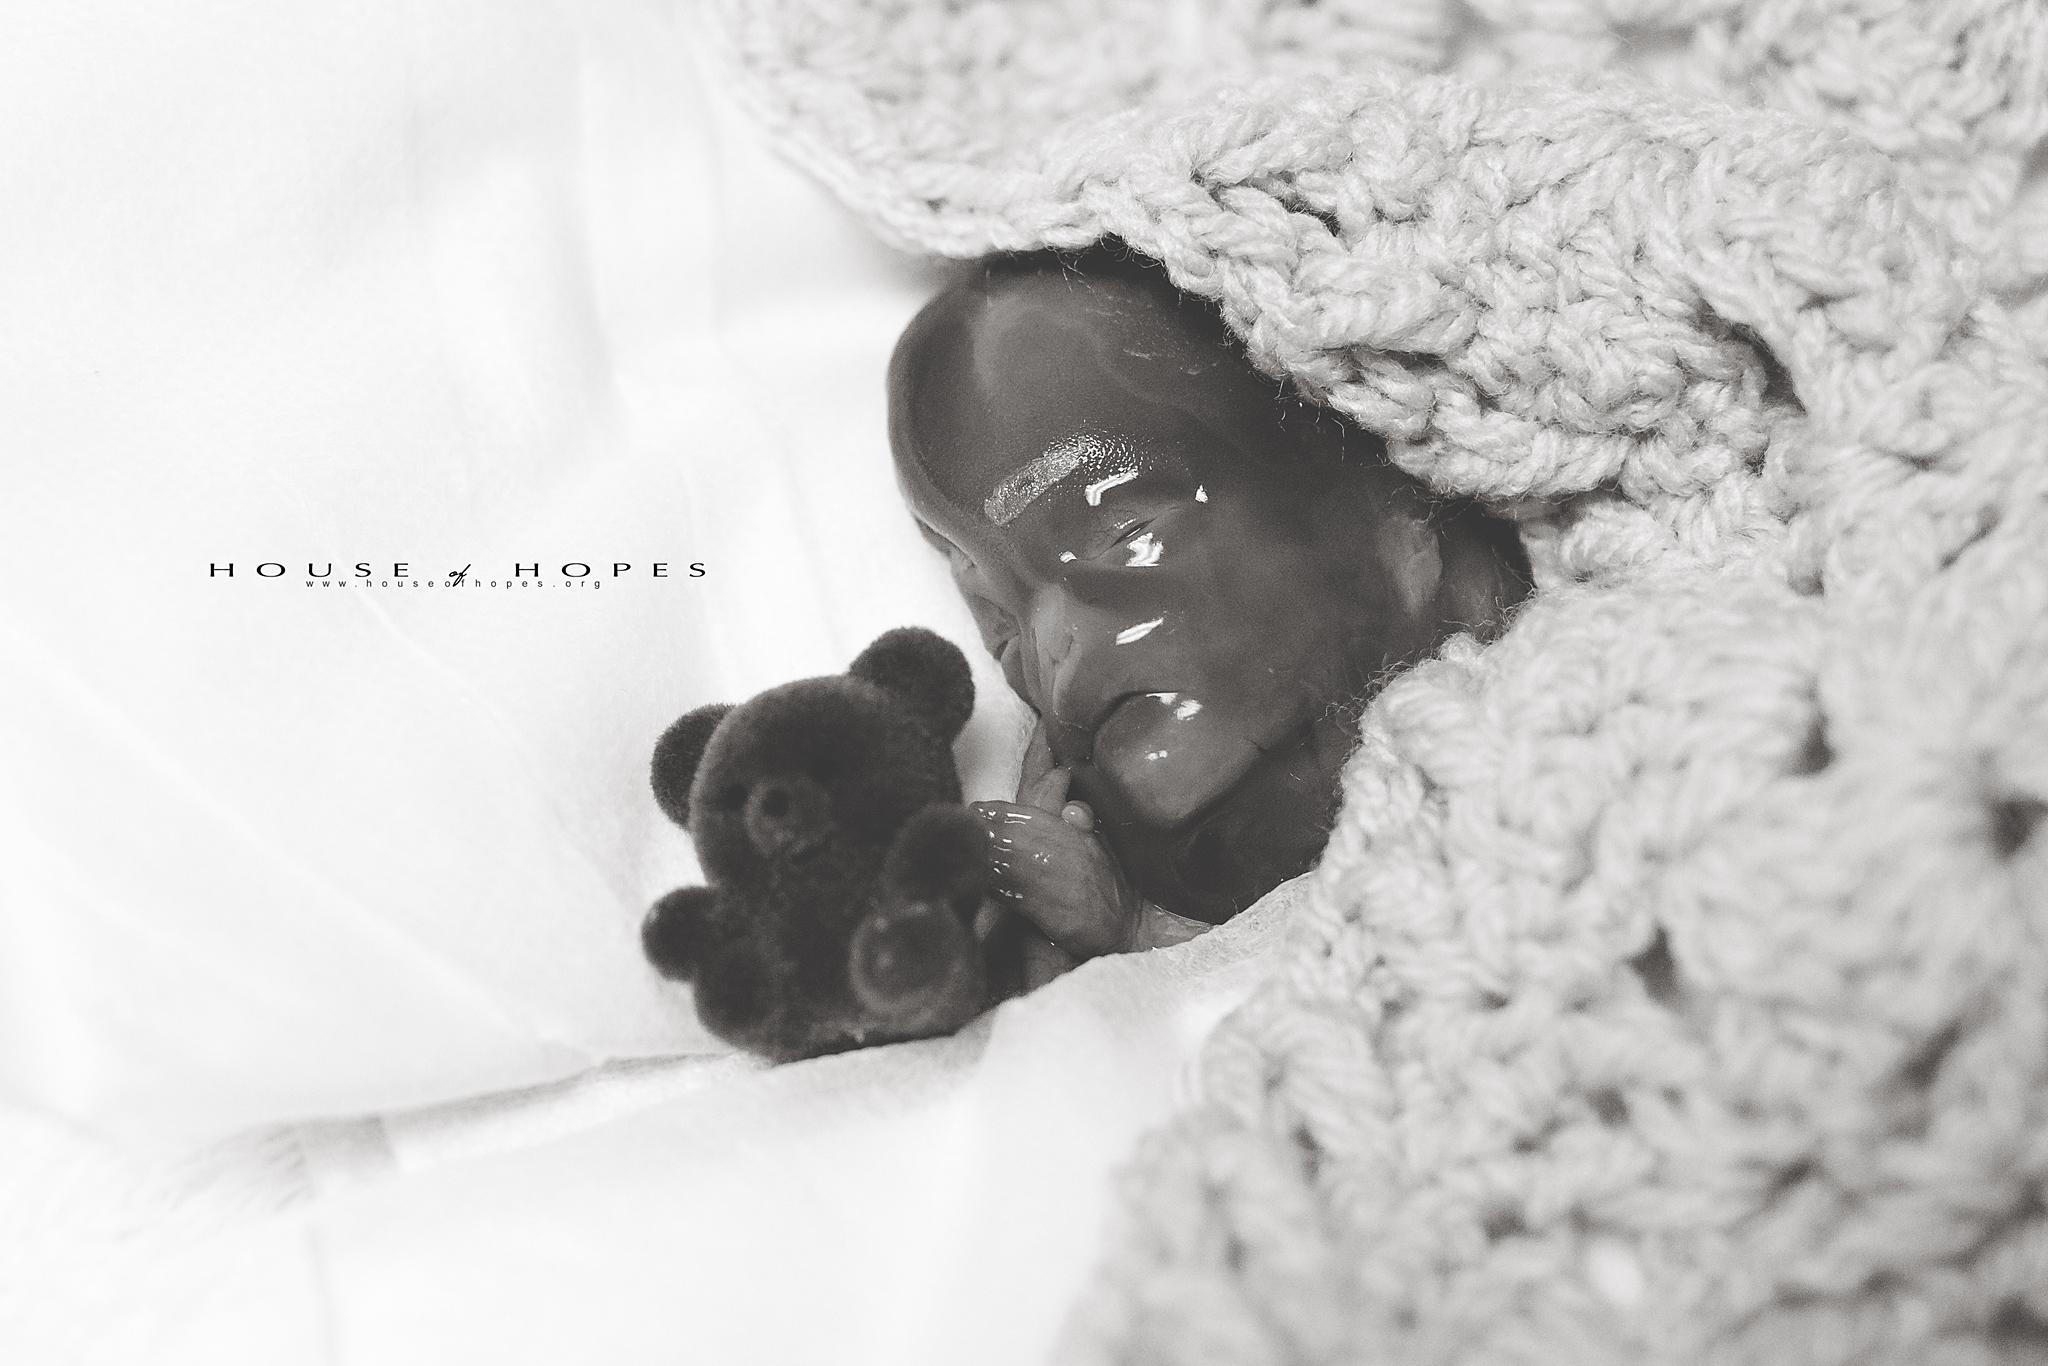 Roman Stewart with bear